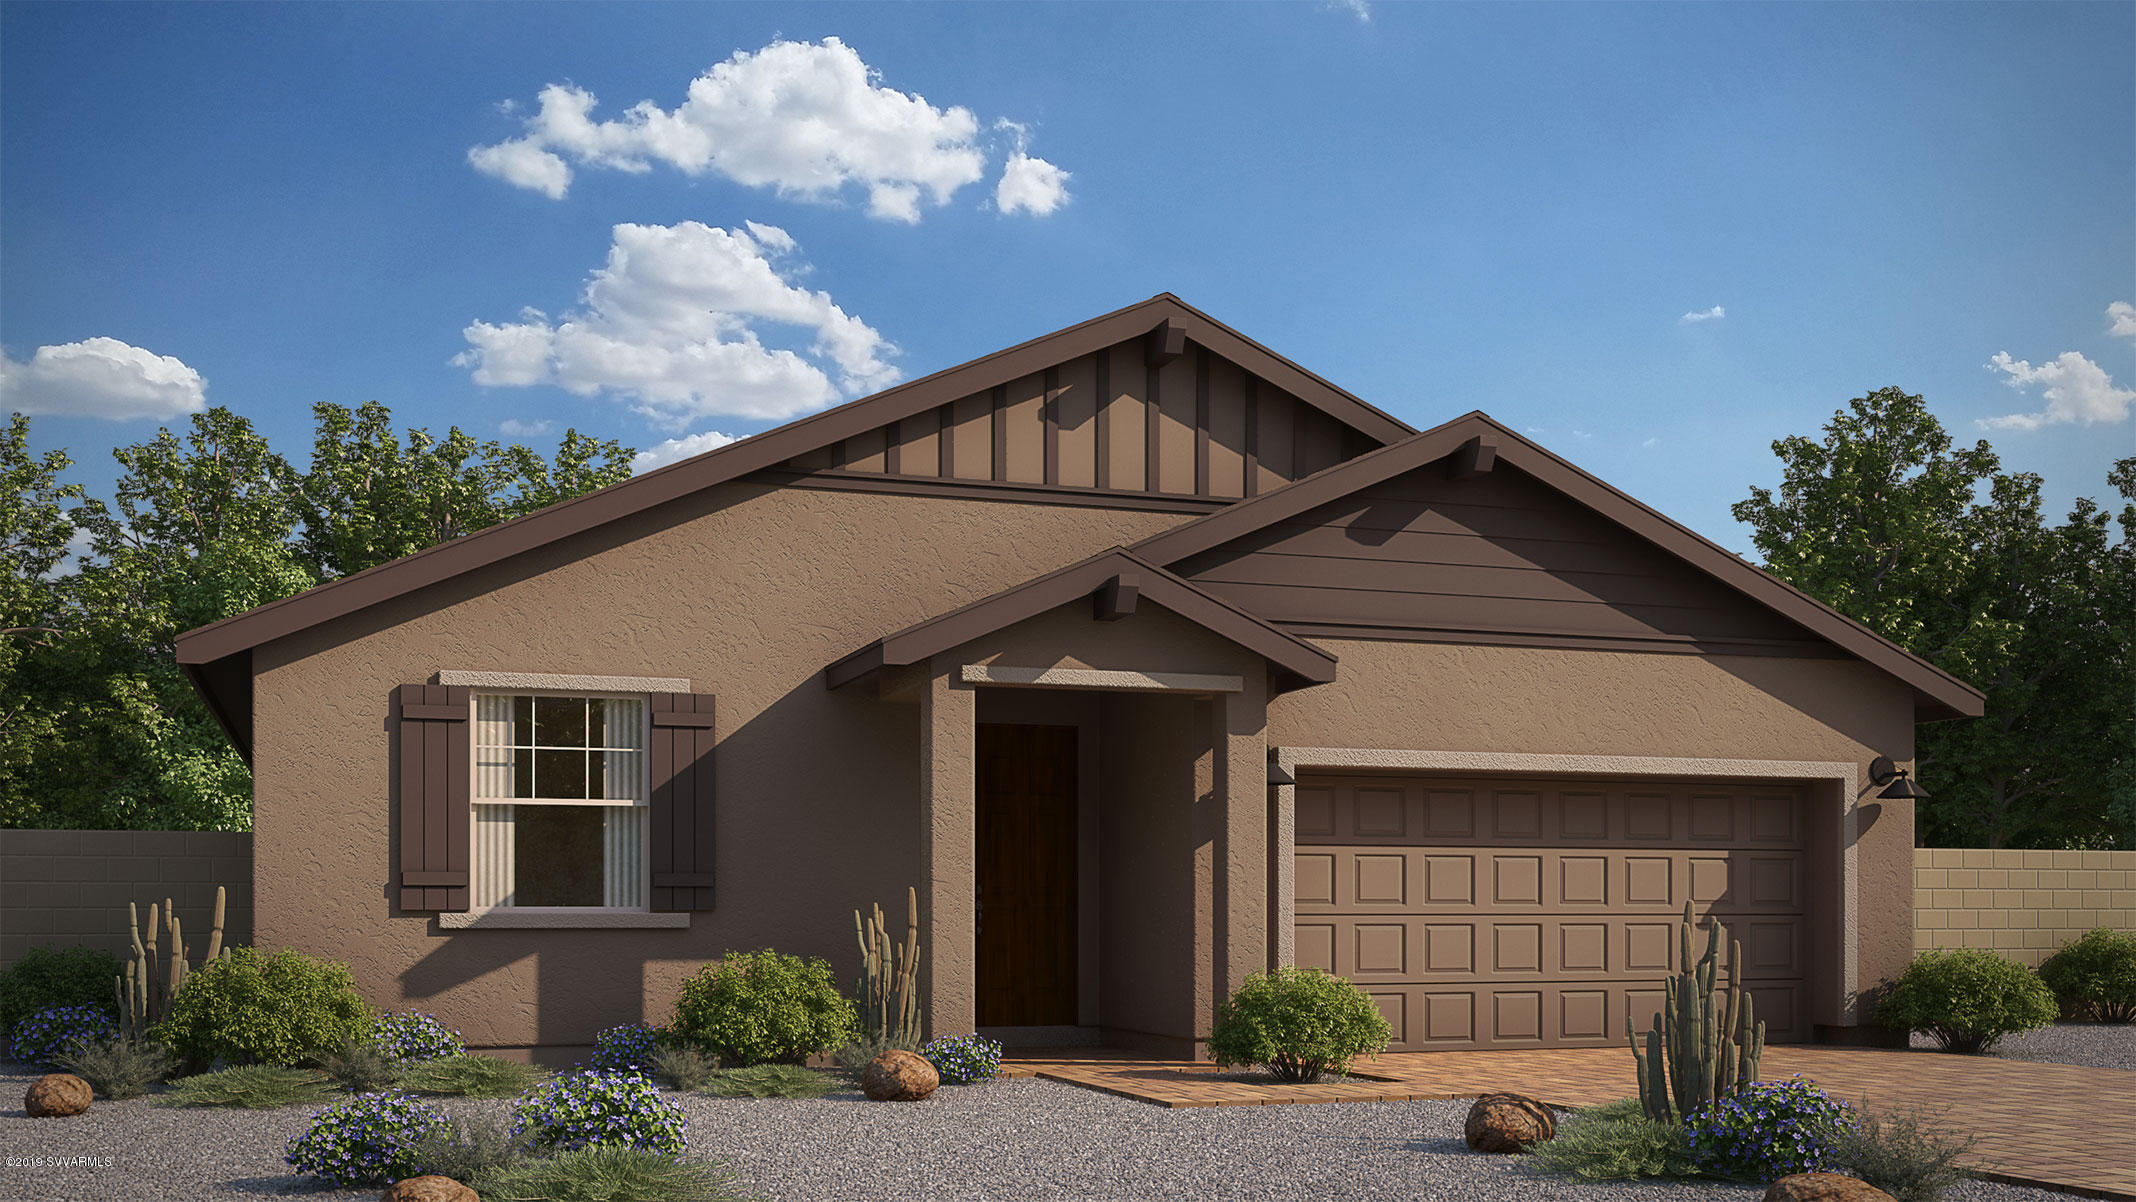 302 Whistle Stop Rd Clarkdale, AZ 86324